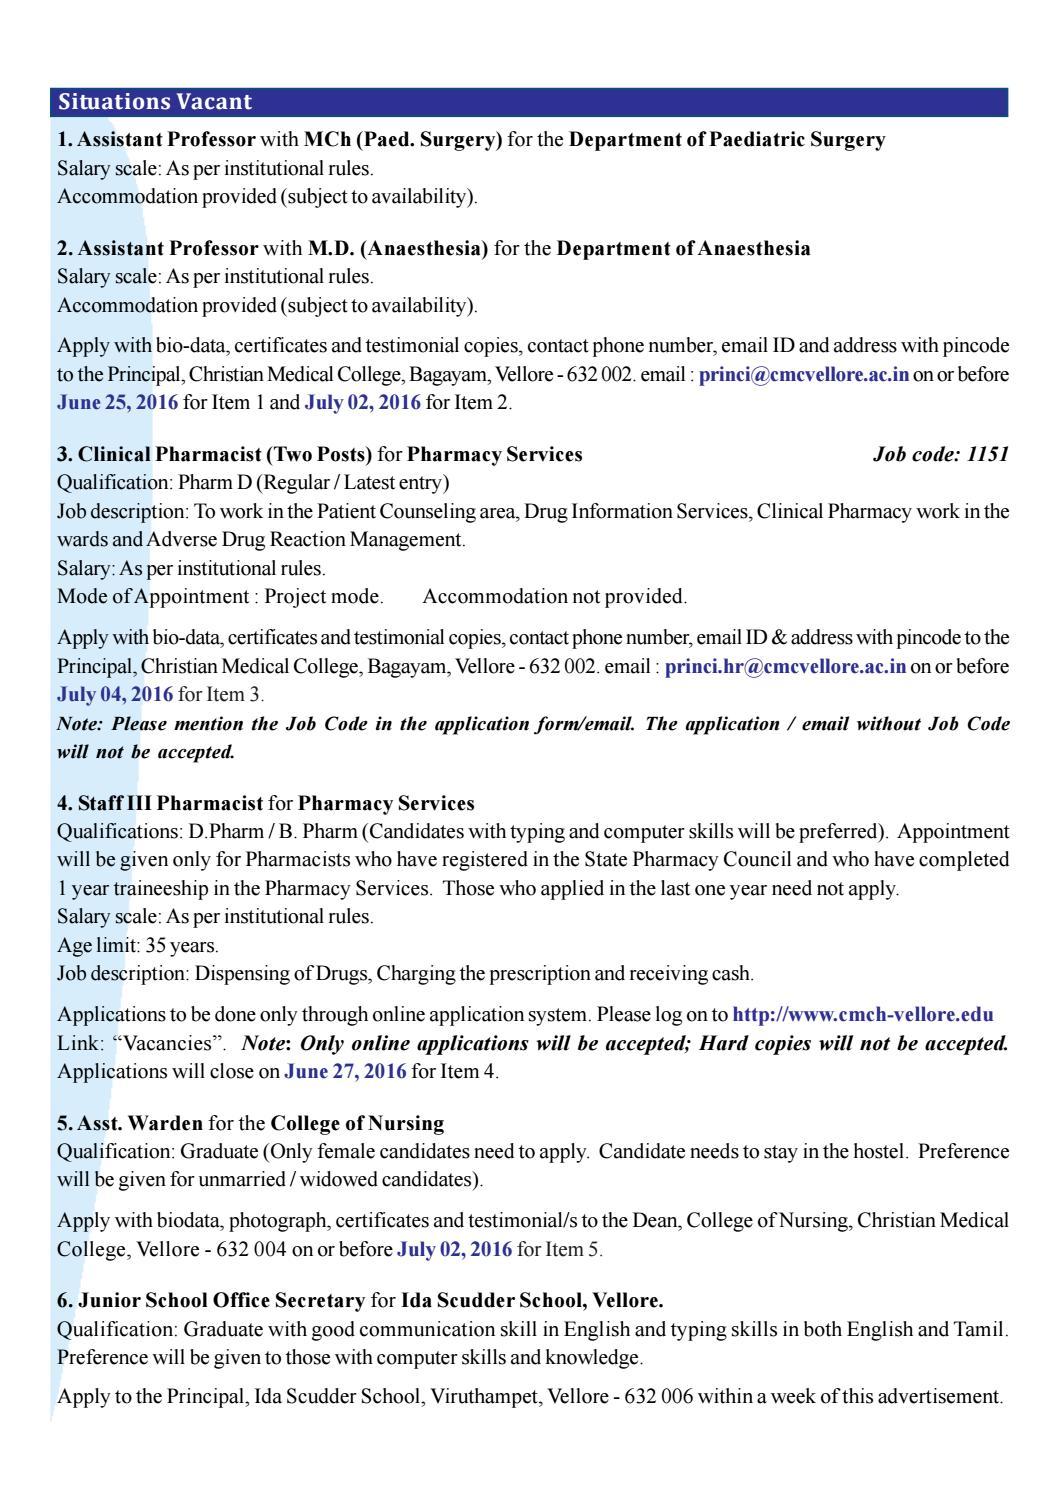 cmc-newsline-20-jun-2016-vol-no-53-no-51 by Vellore CMC Foundation